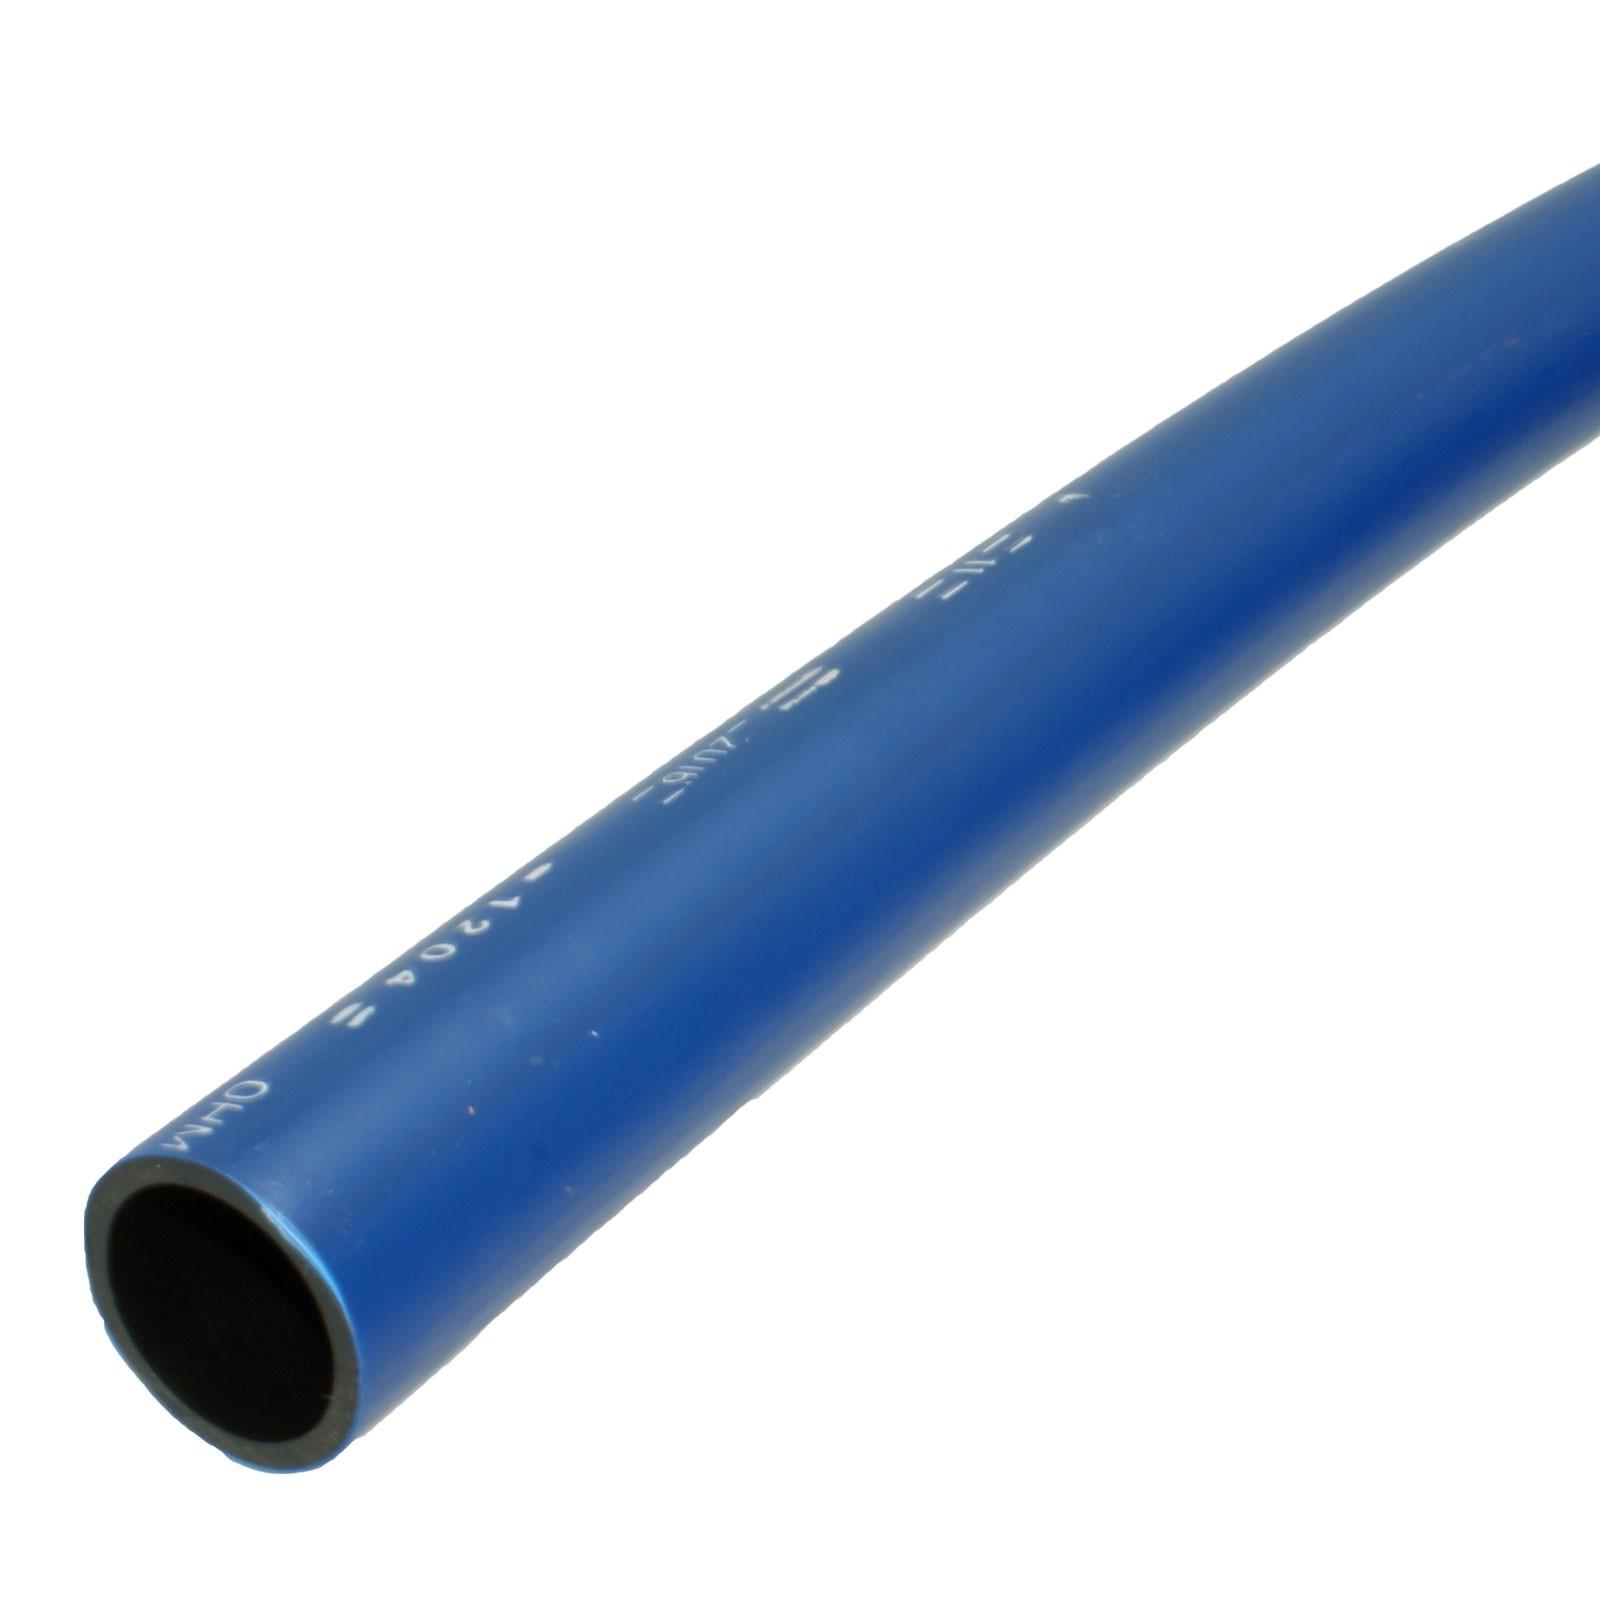 pe rc rohr pe100 pn16 100m 1 2 zoll 20mm trinkwasser blau. Black Bedroom Furniture Sets. Home Design Ideas